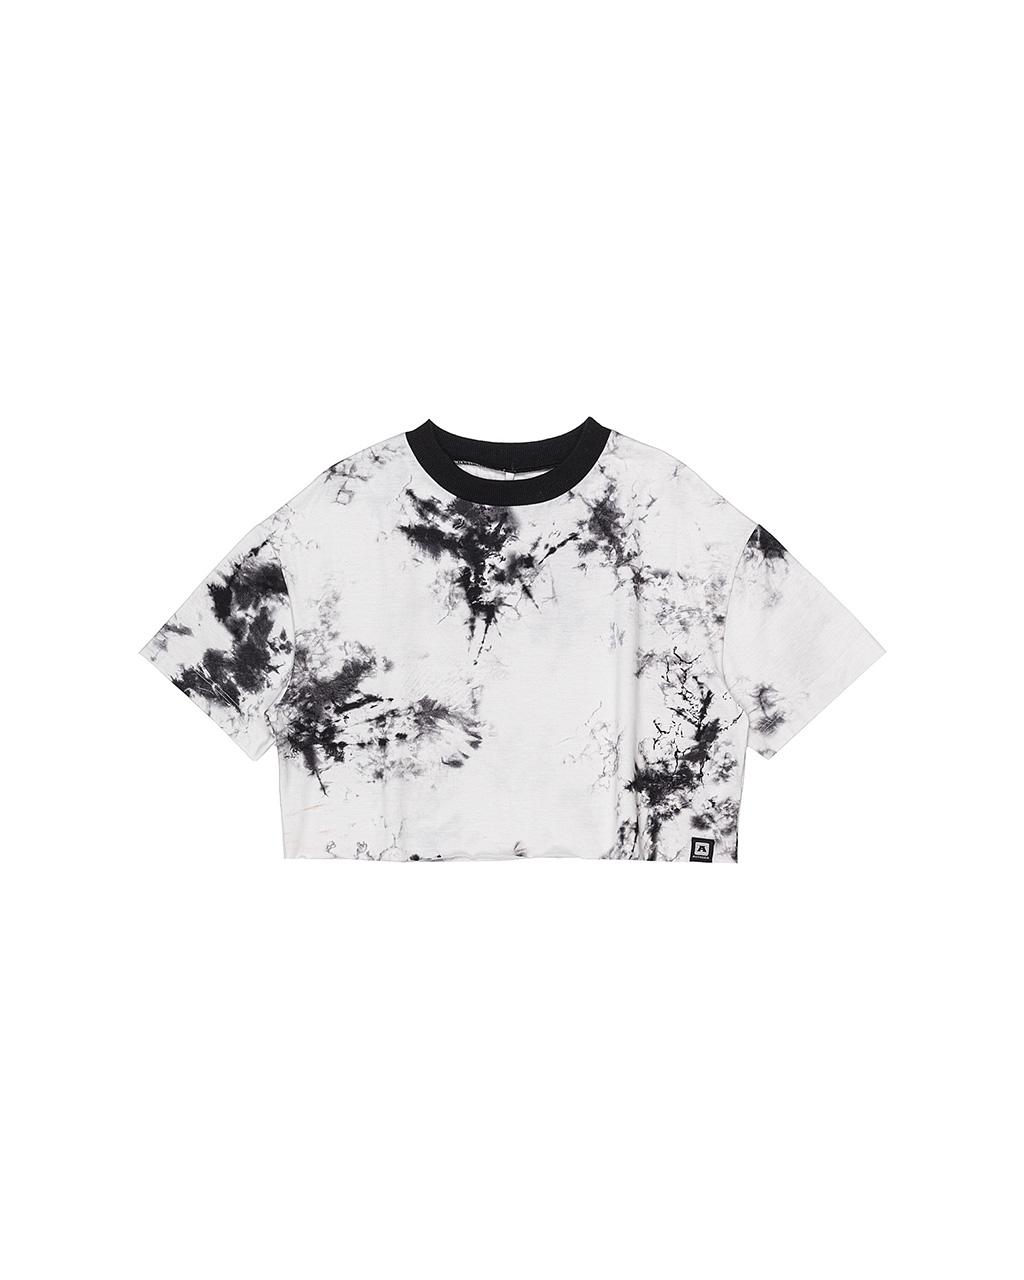 T-Shirt Teen Tie Dye Marble Authoria